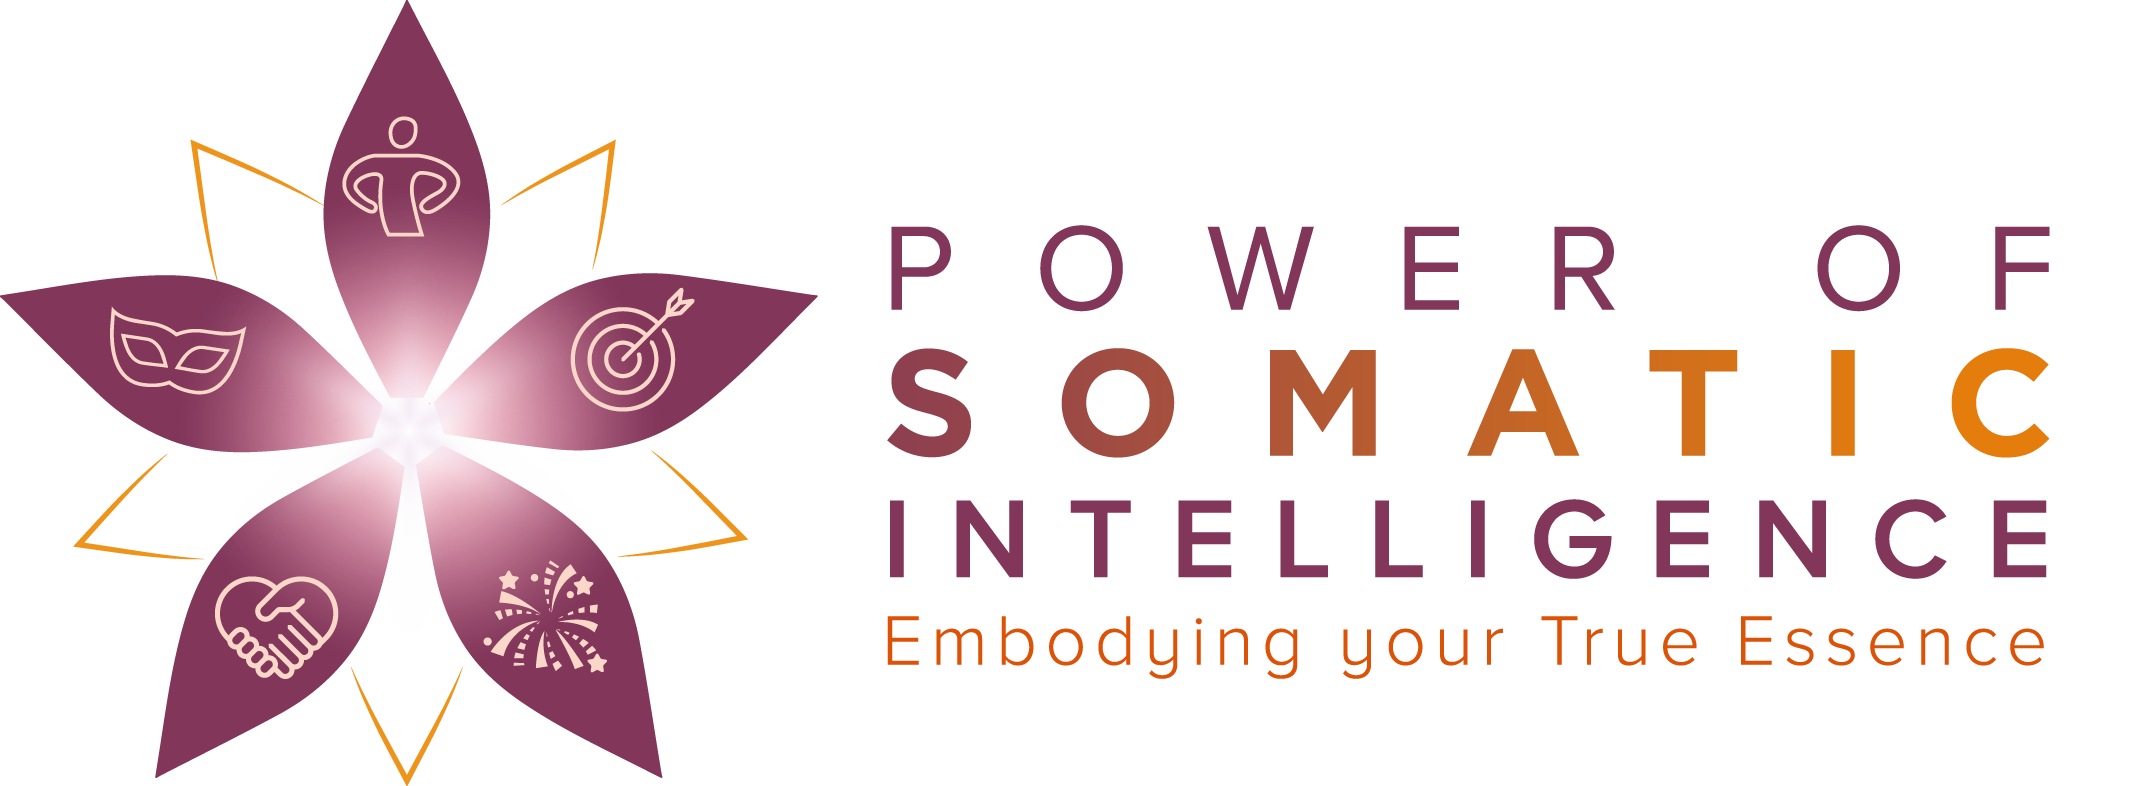 Power of Somatic Intelligence